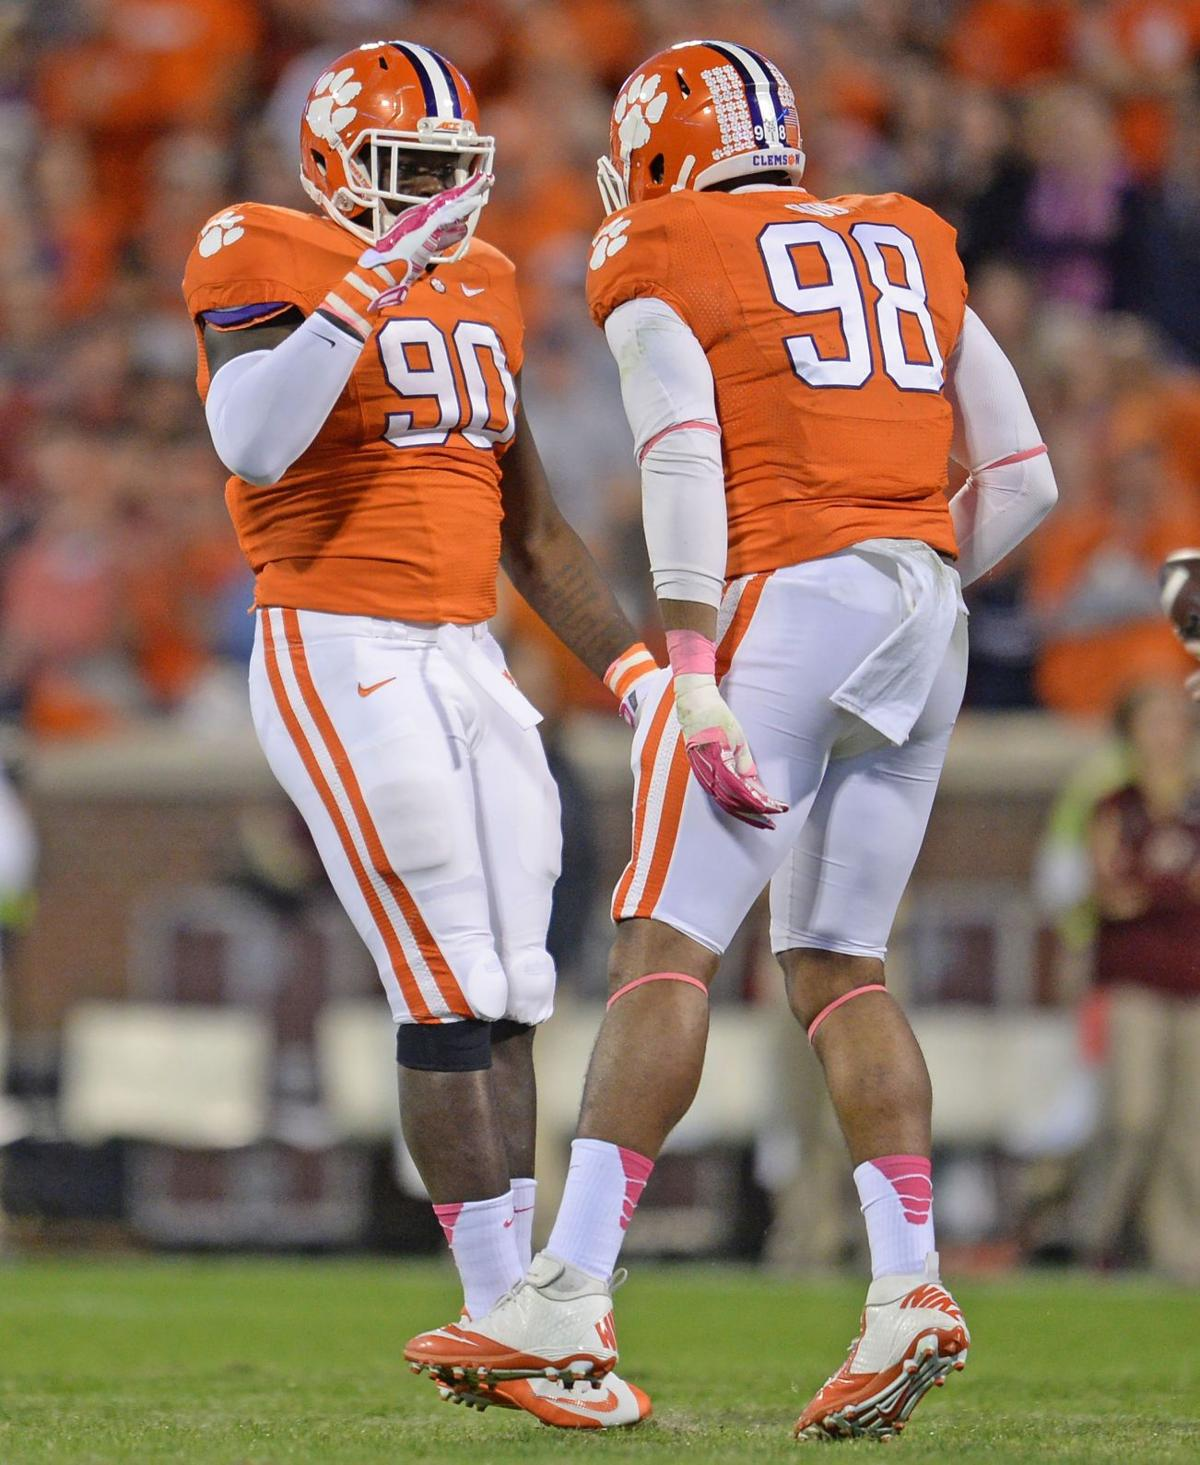 Clemson's Lawson, Dodd to battle for NFL draft position